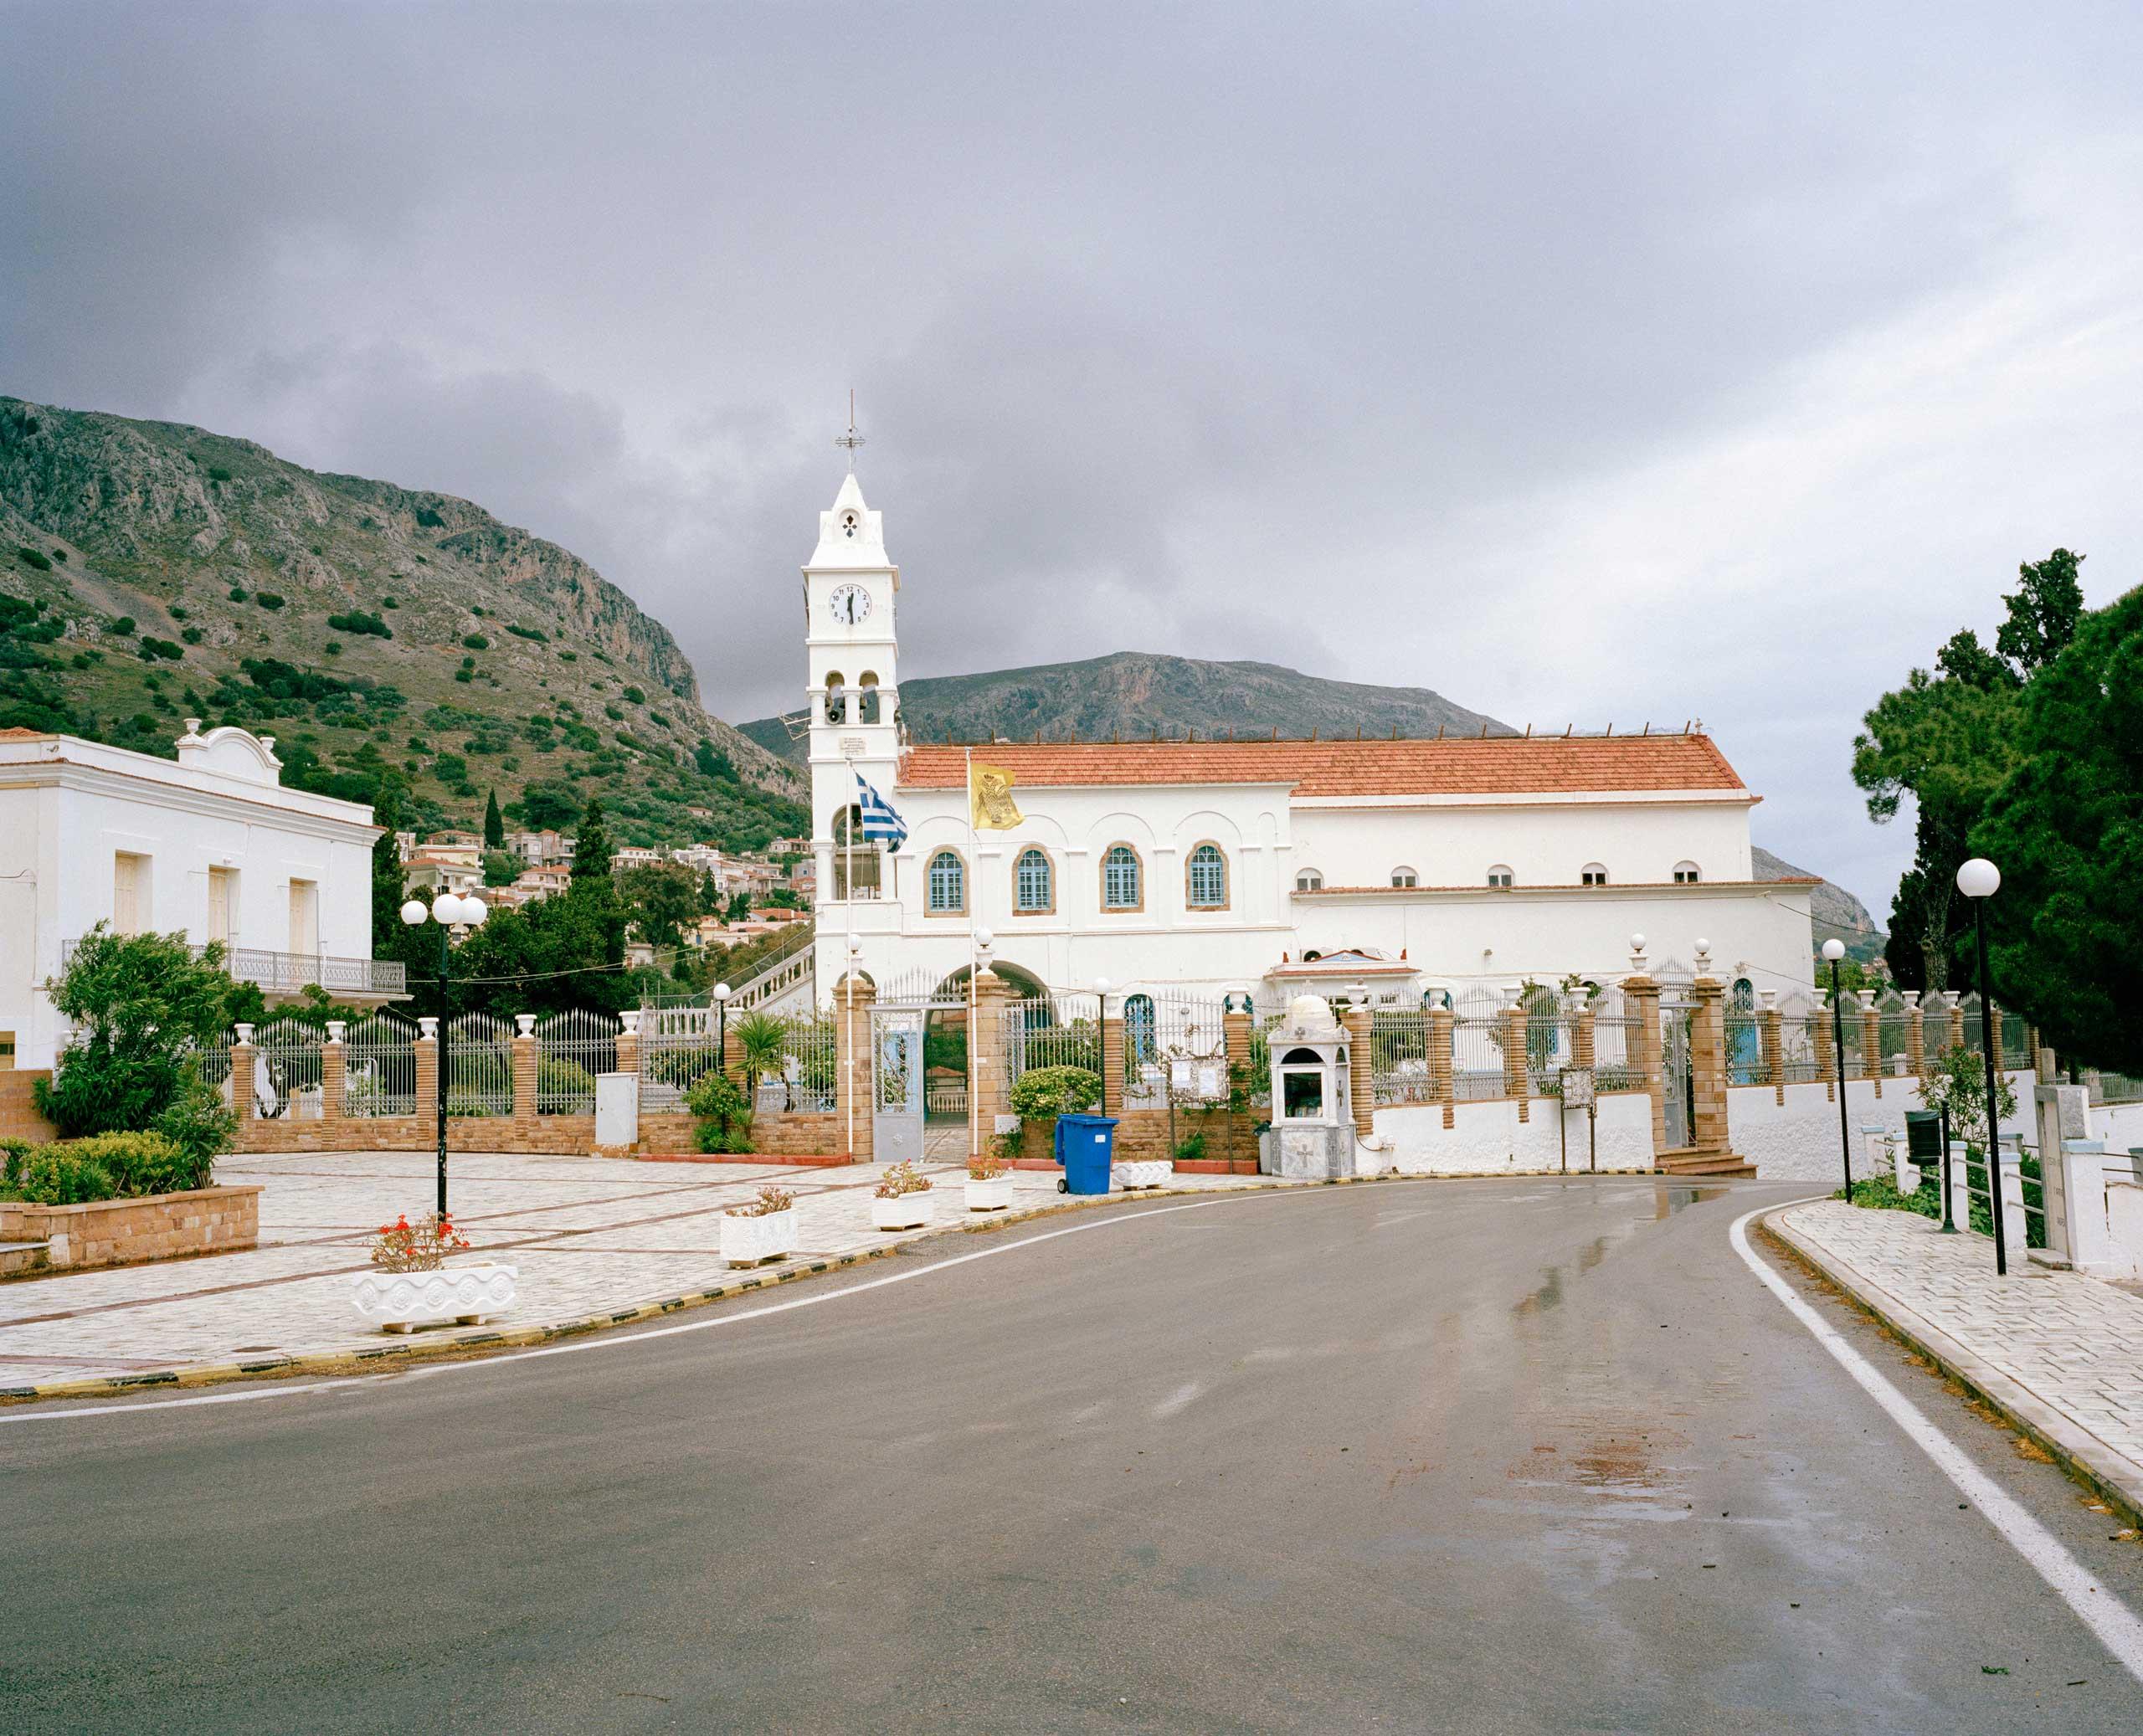 The church of Panageia Erithiani in Vrontados, Chios, Greece.